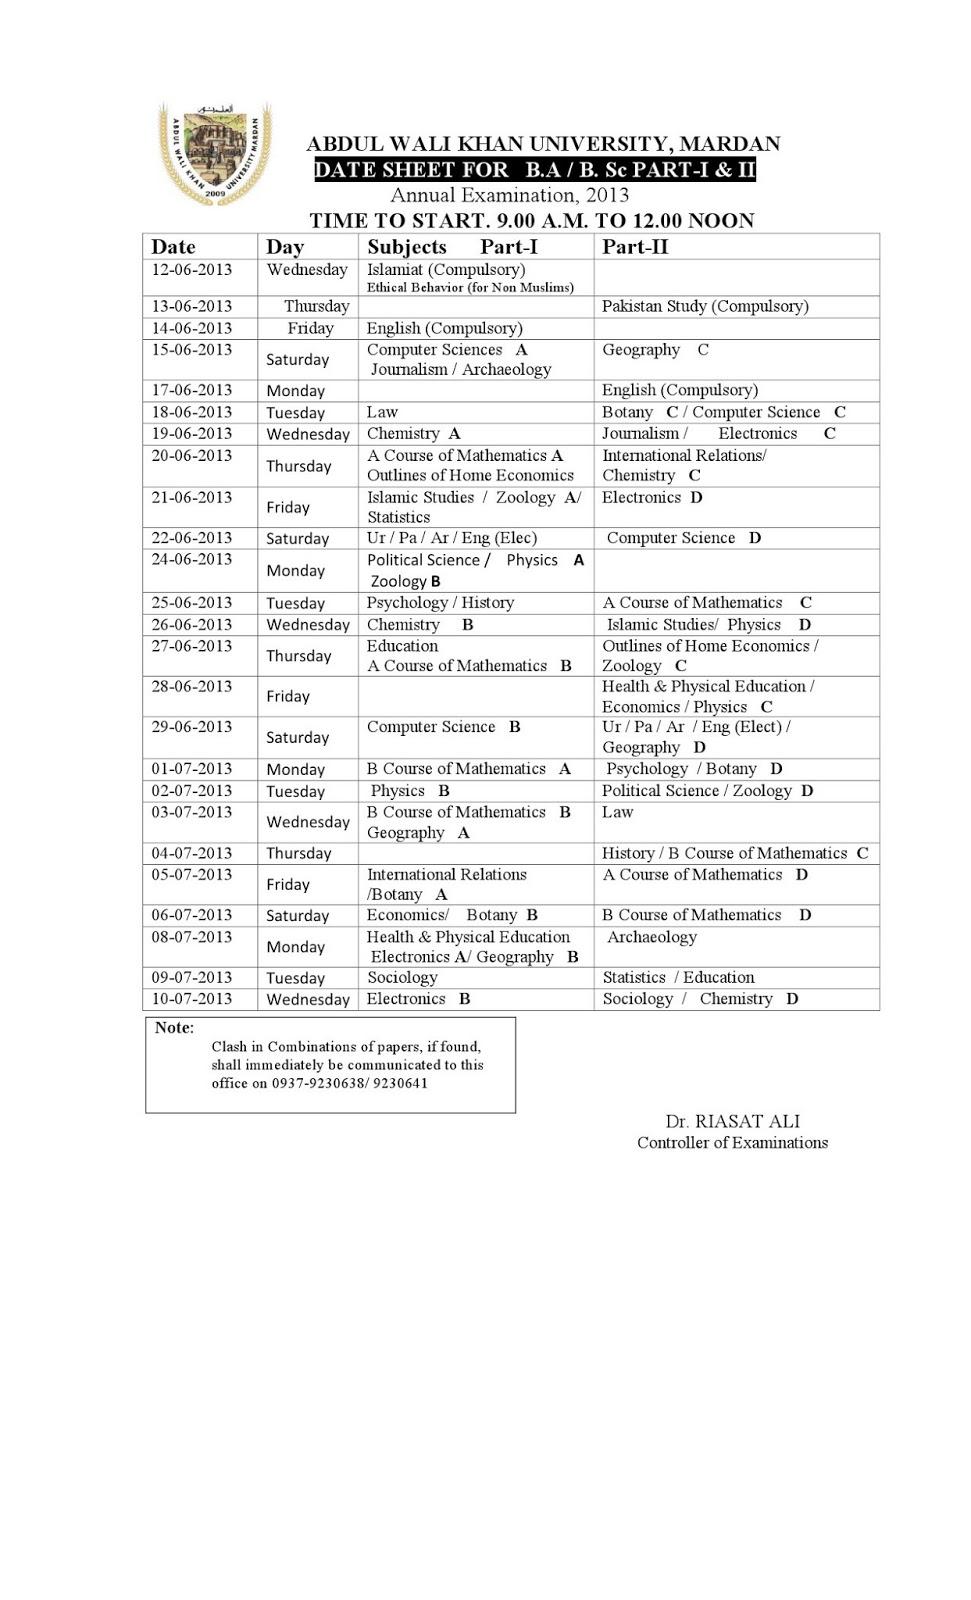 Abdul Wali Khan University Mardan BA/BSc date sheet 2013